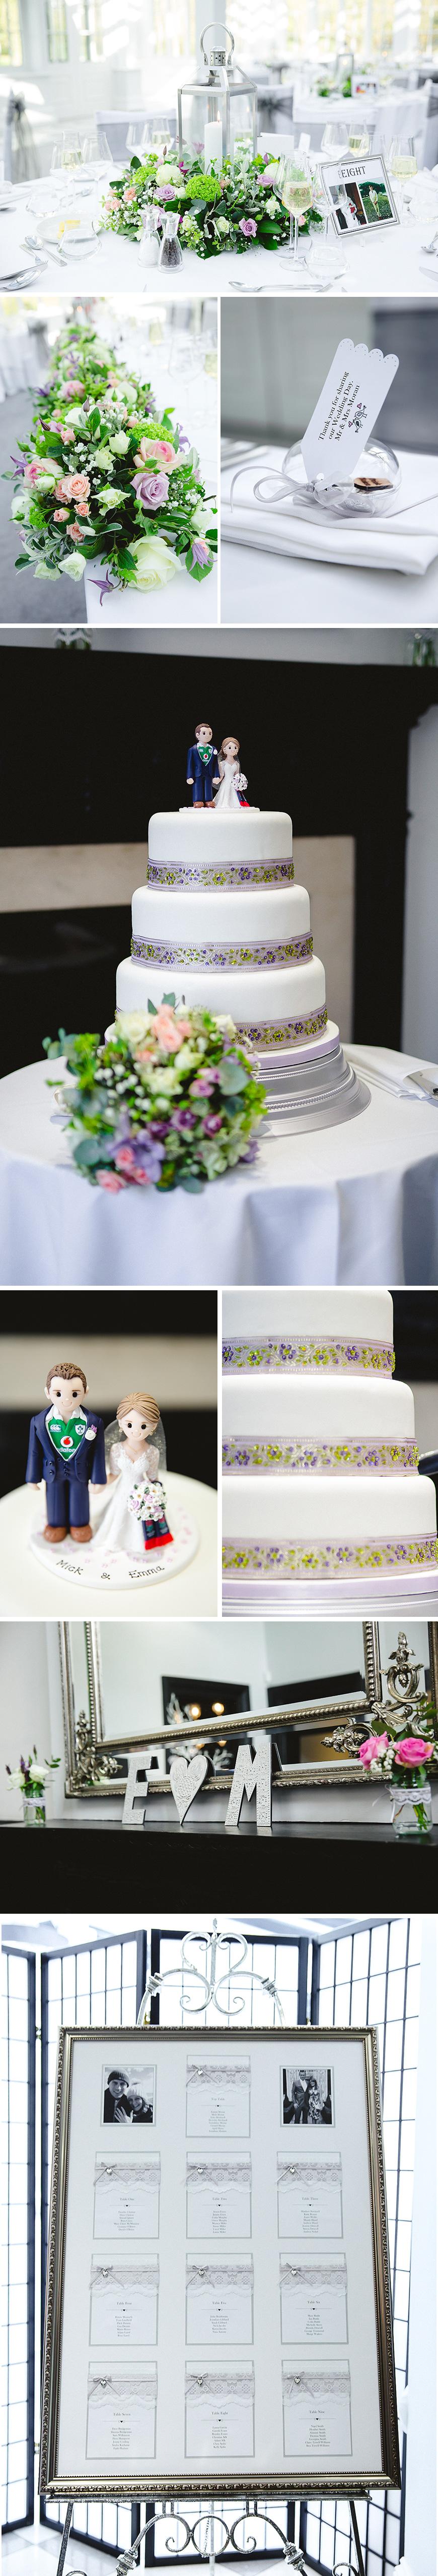 Real Wedding - Emma and Mick's Stunning Spring Wedding at Swynford Manor | CHWV